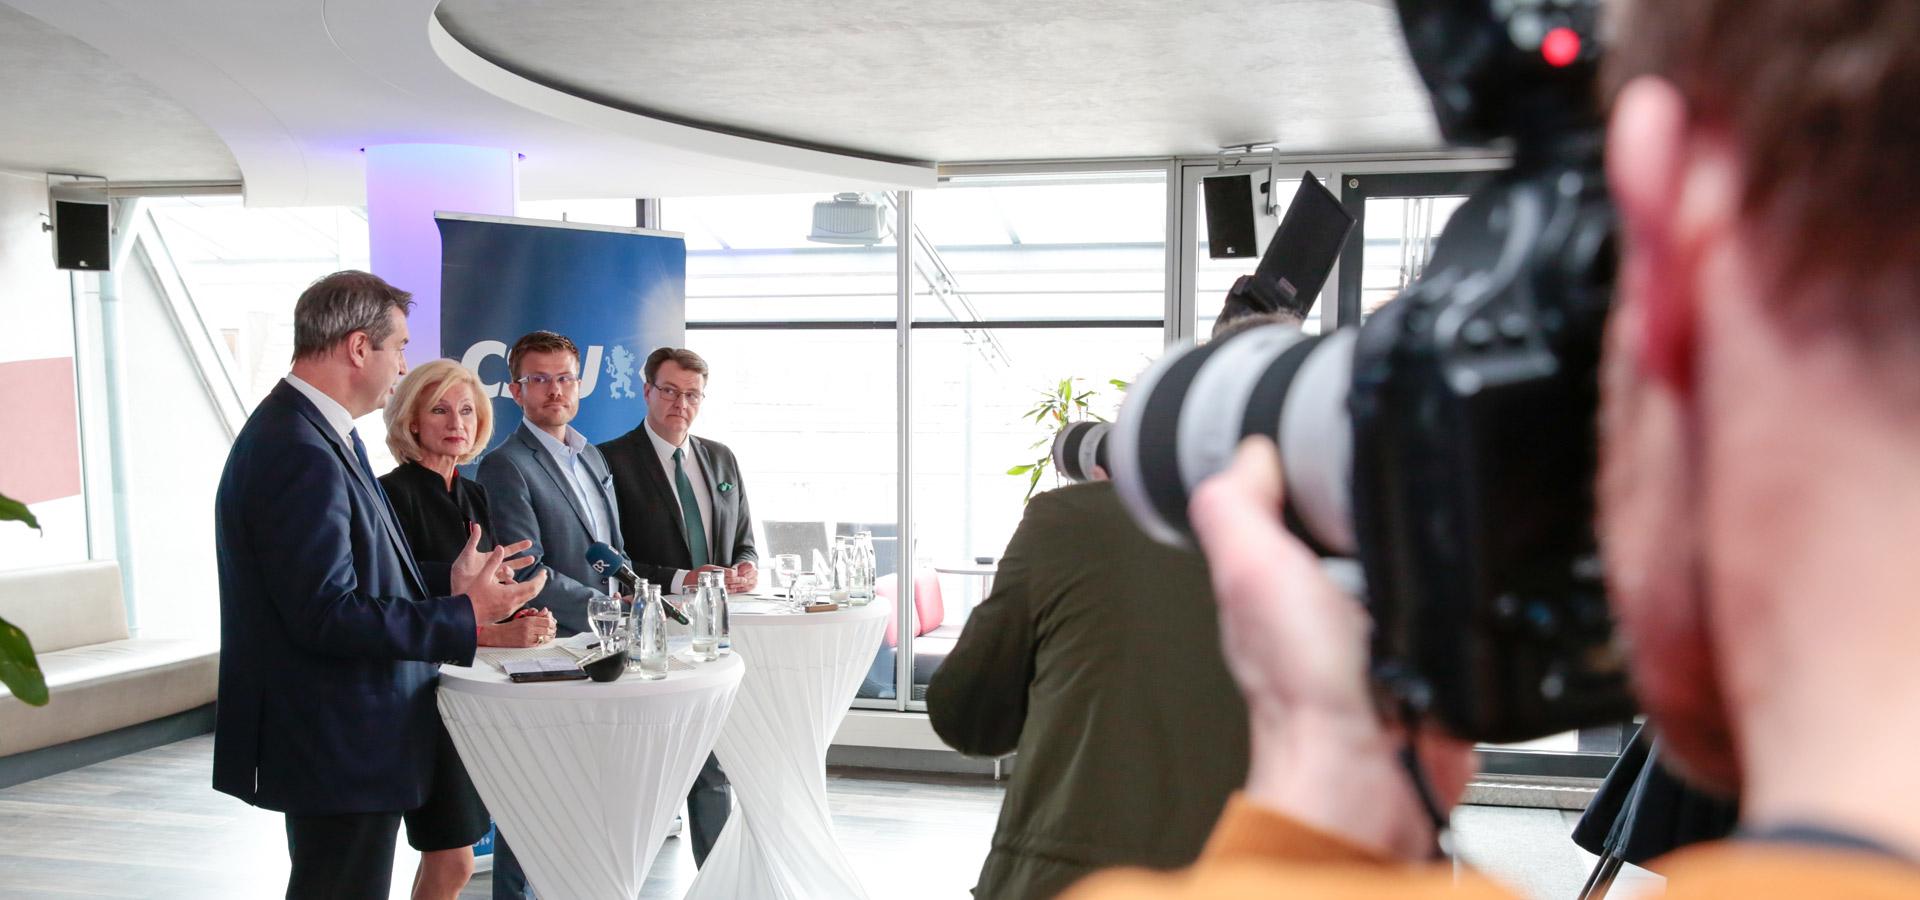 CSU Stadtratsfraktion Nürnberg - Pressekonferenz